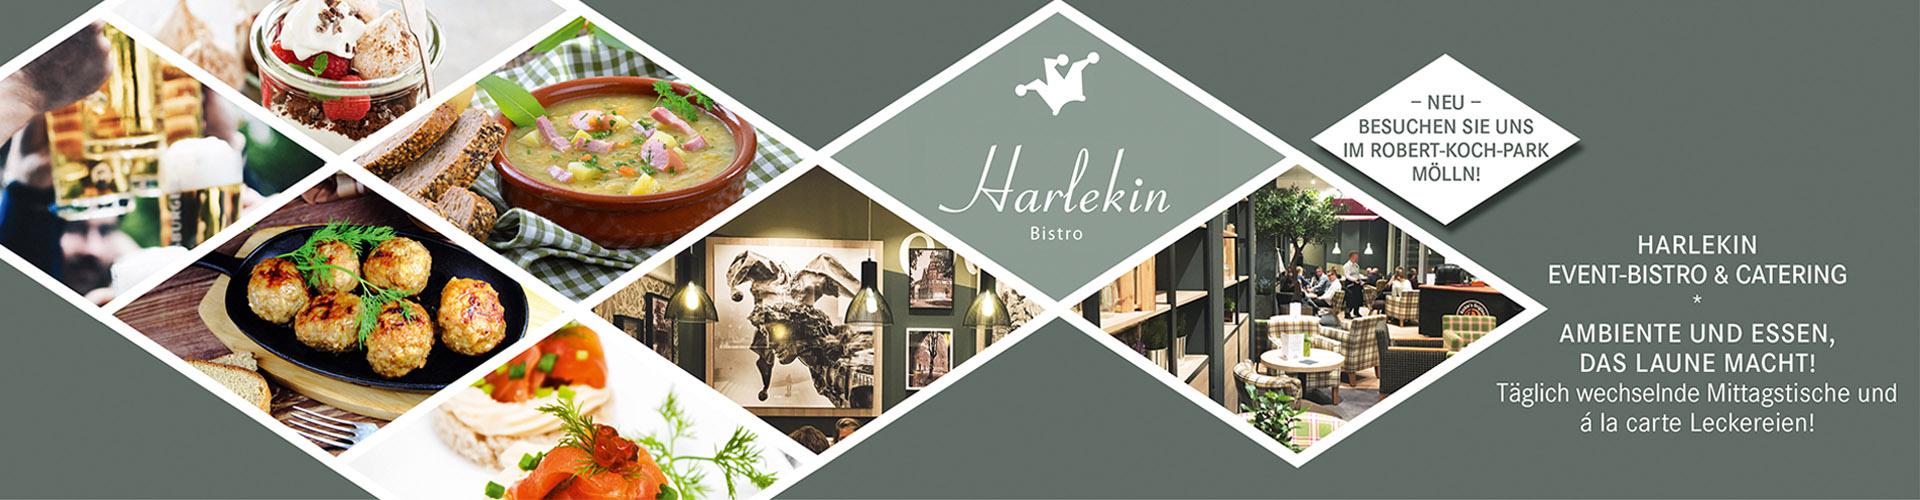 Harlekin_Header